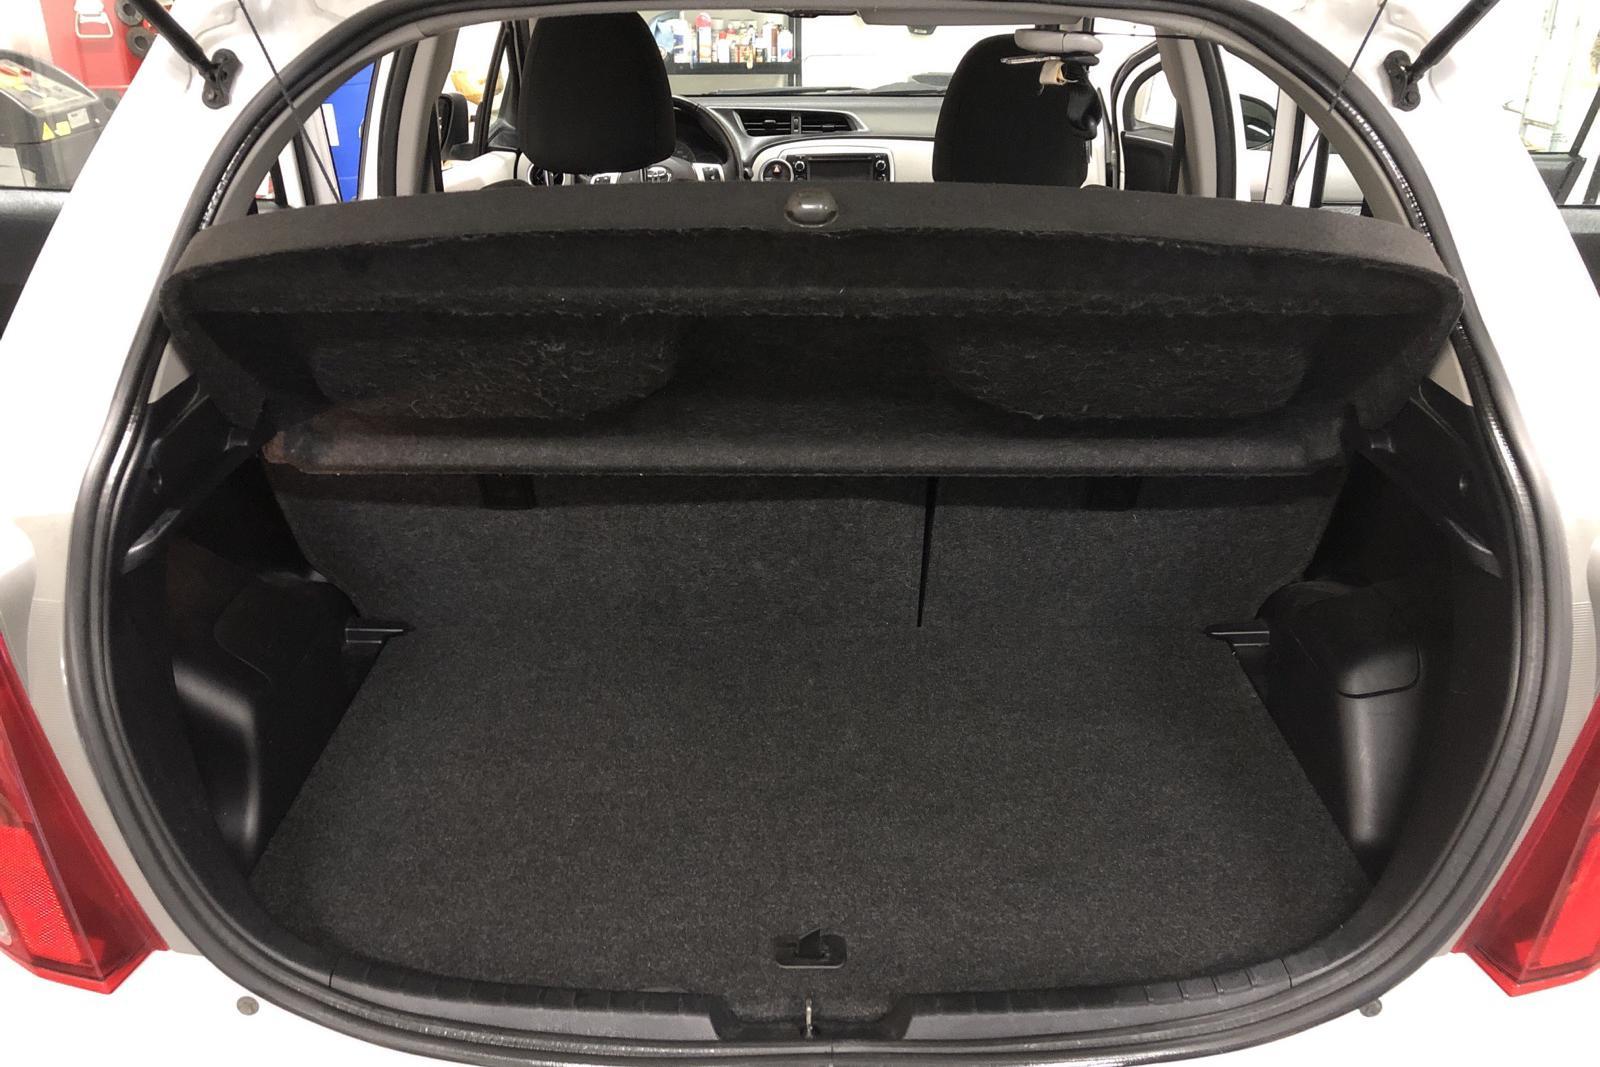 Toyota Yaris 1.33 5dr (100hk) - 102 930 km - Manual - white - 2012